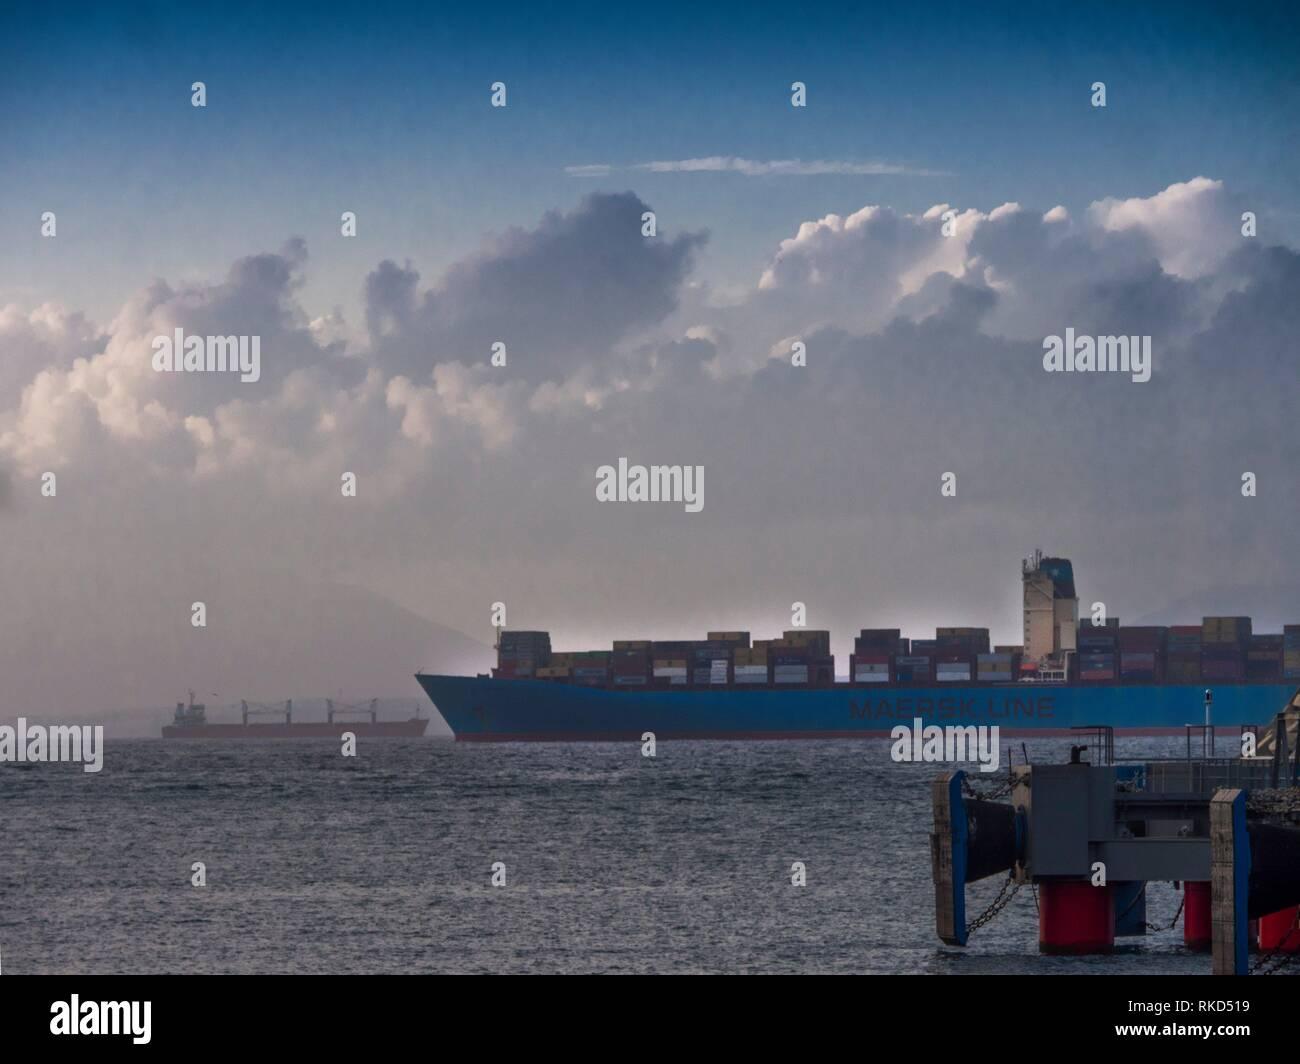 Morocco, the Strait of Gibraltar from Tanger Med harbour. - Stock Image